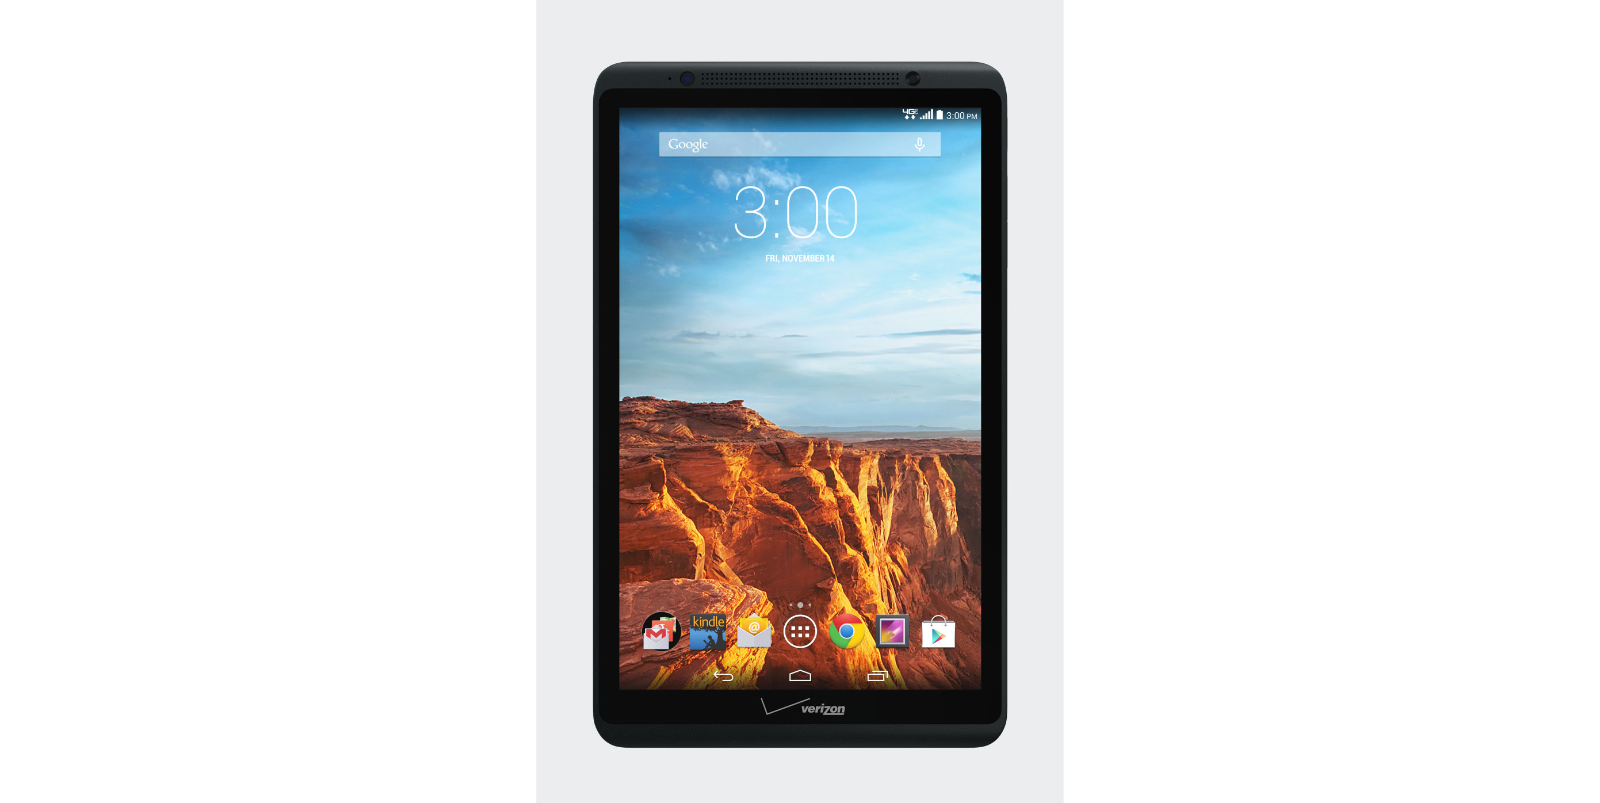 Black - 16GB Ellipsis 8 Tablet Verizon WiFi + Cellular